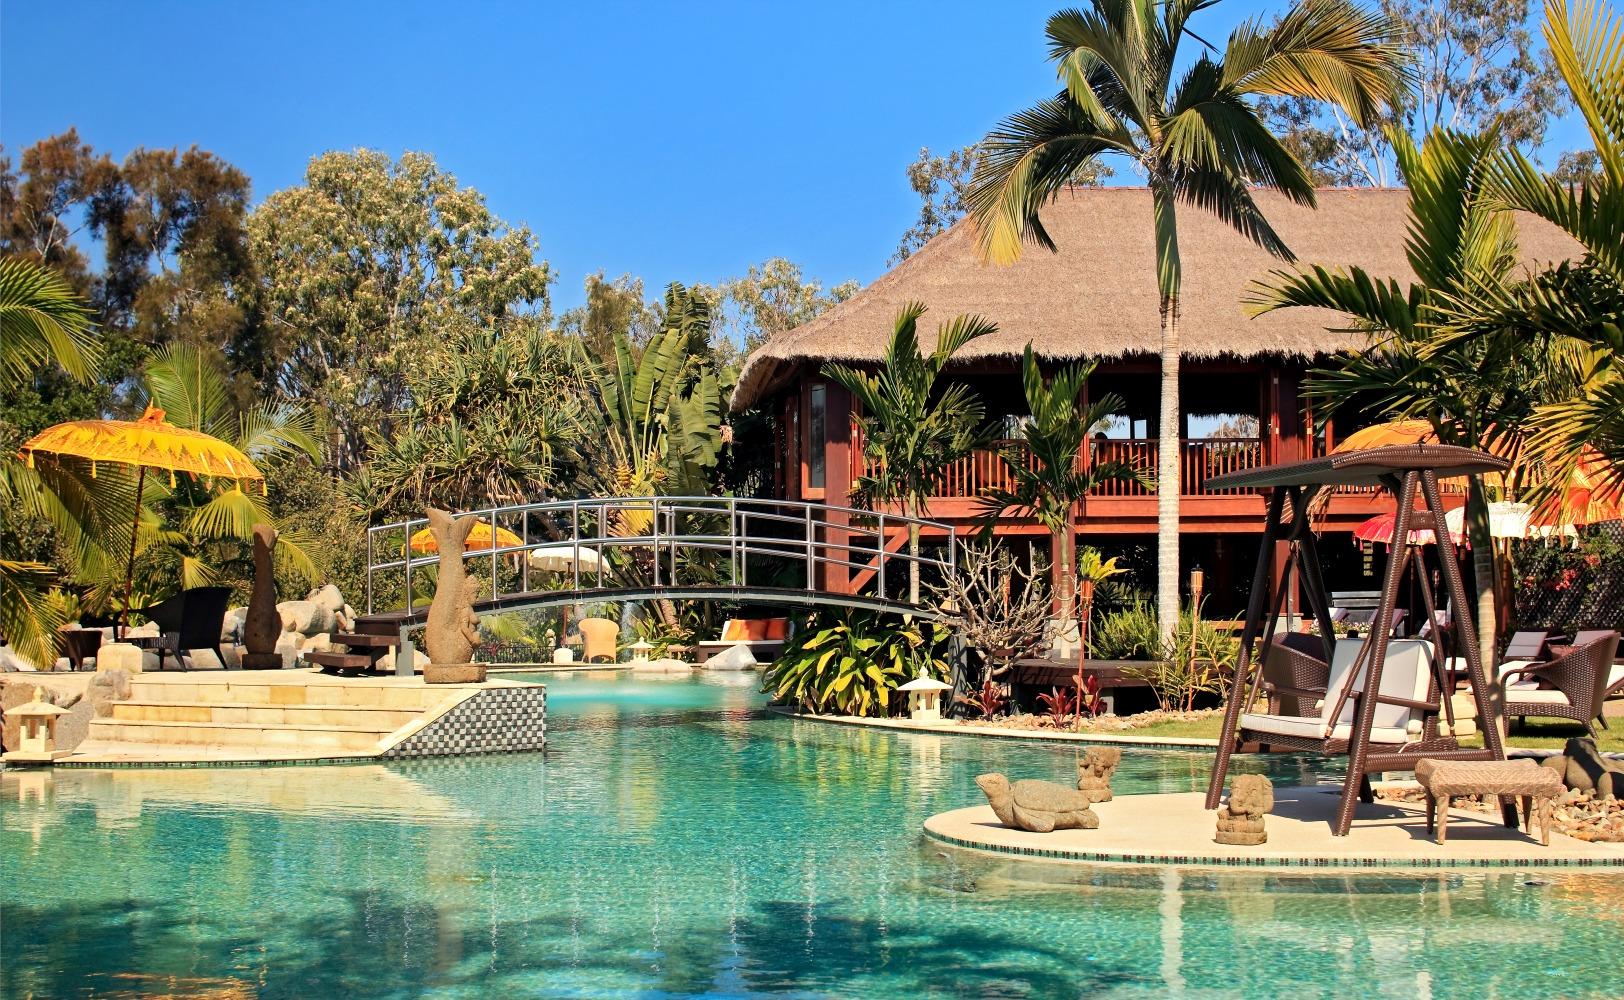 South Pacific Resort Hotel Noosa